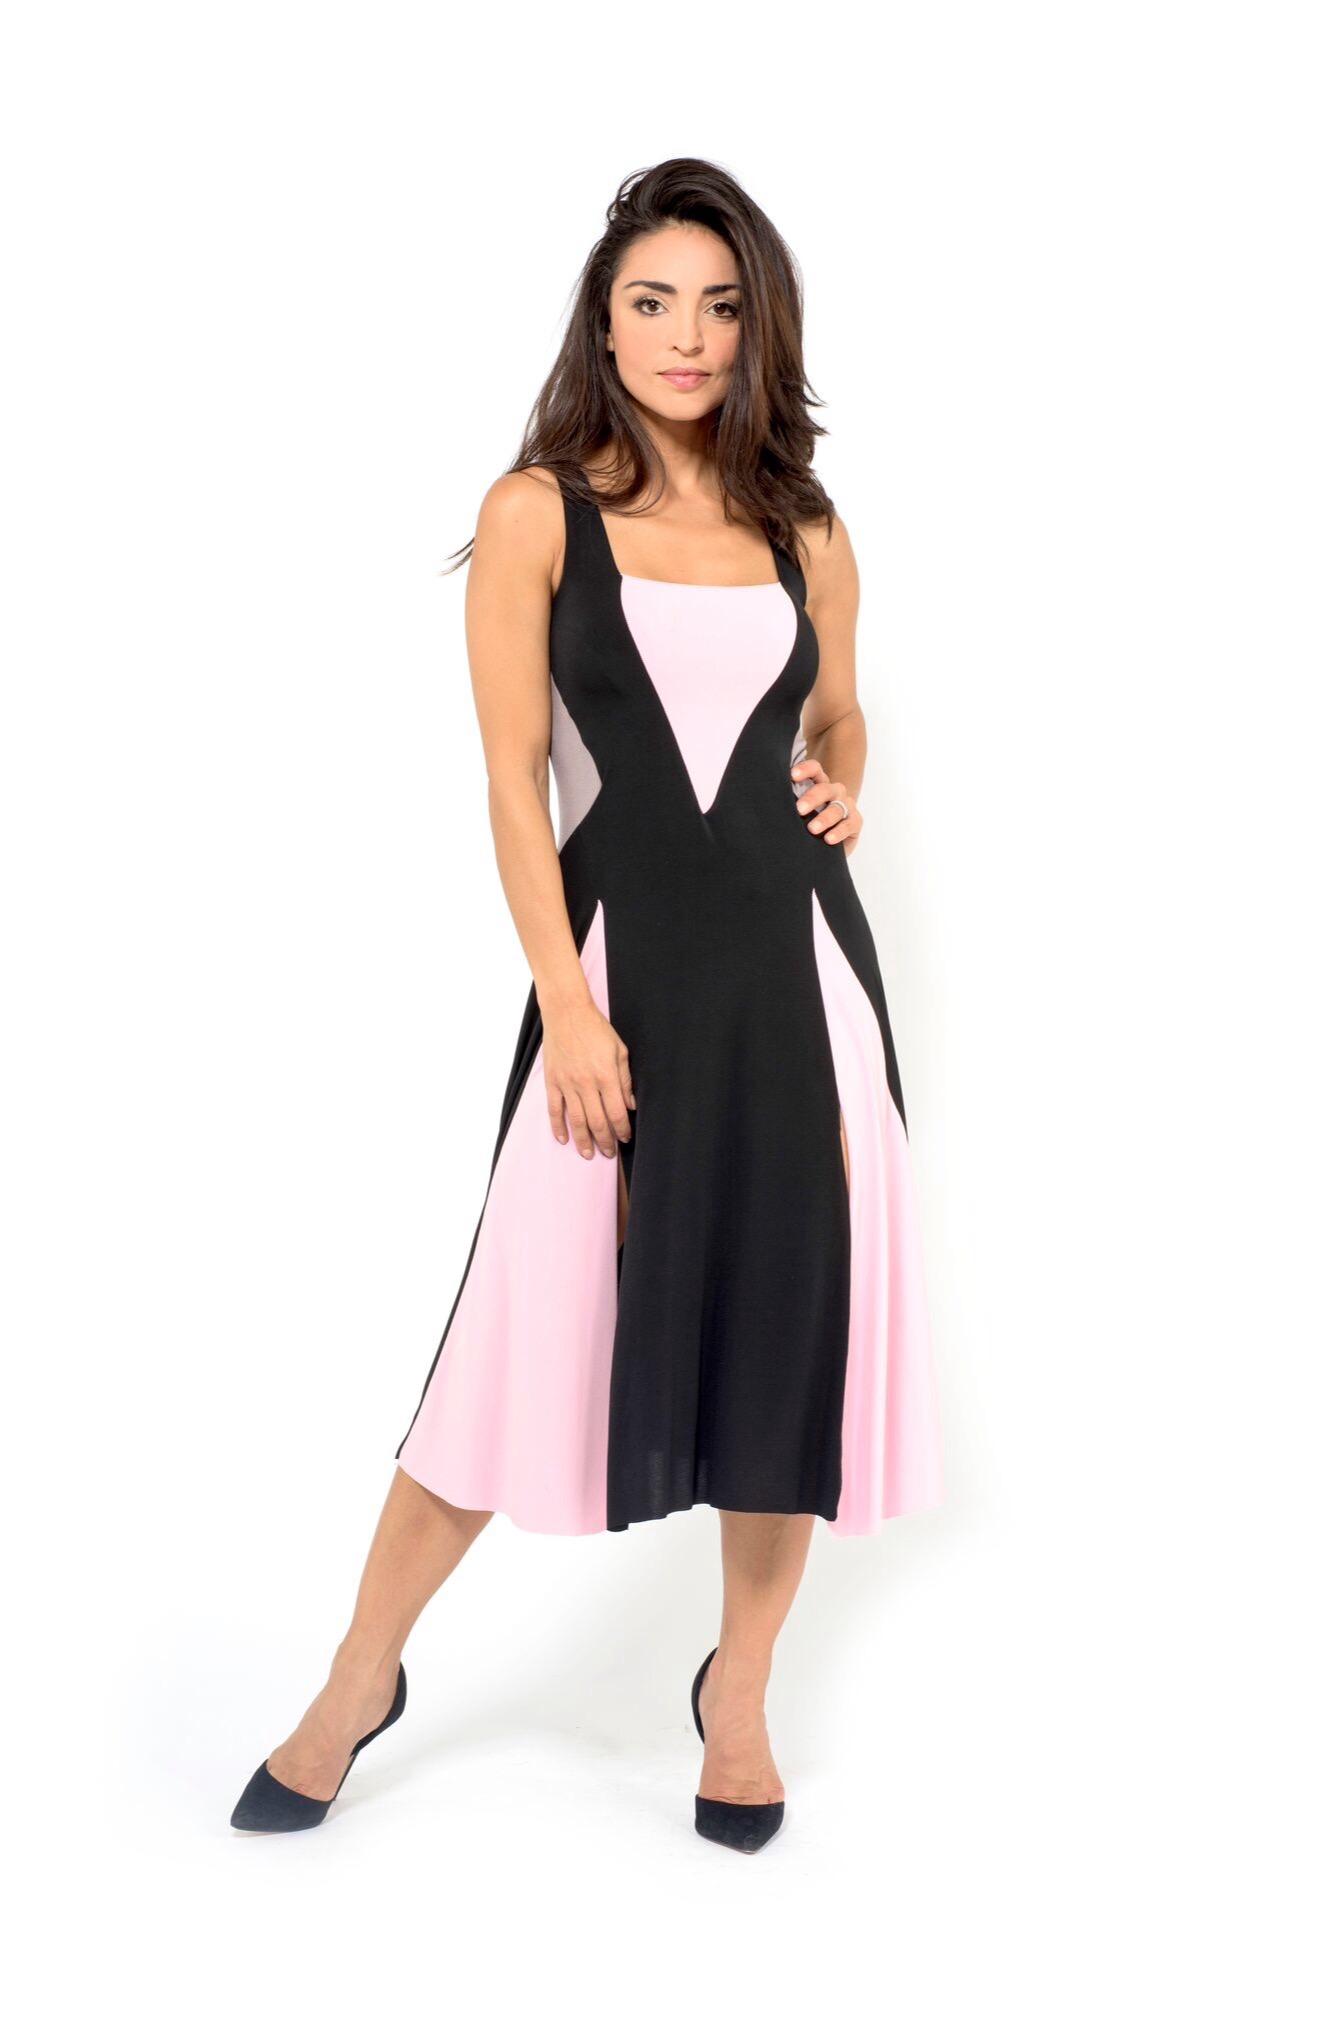 A colored image of rombi tango dress